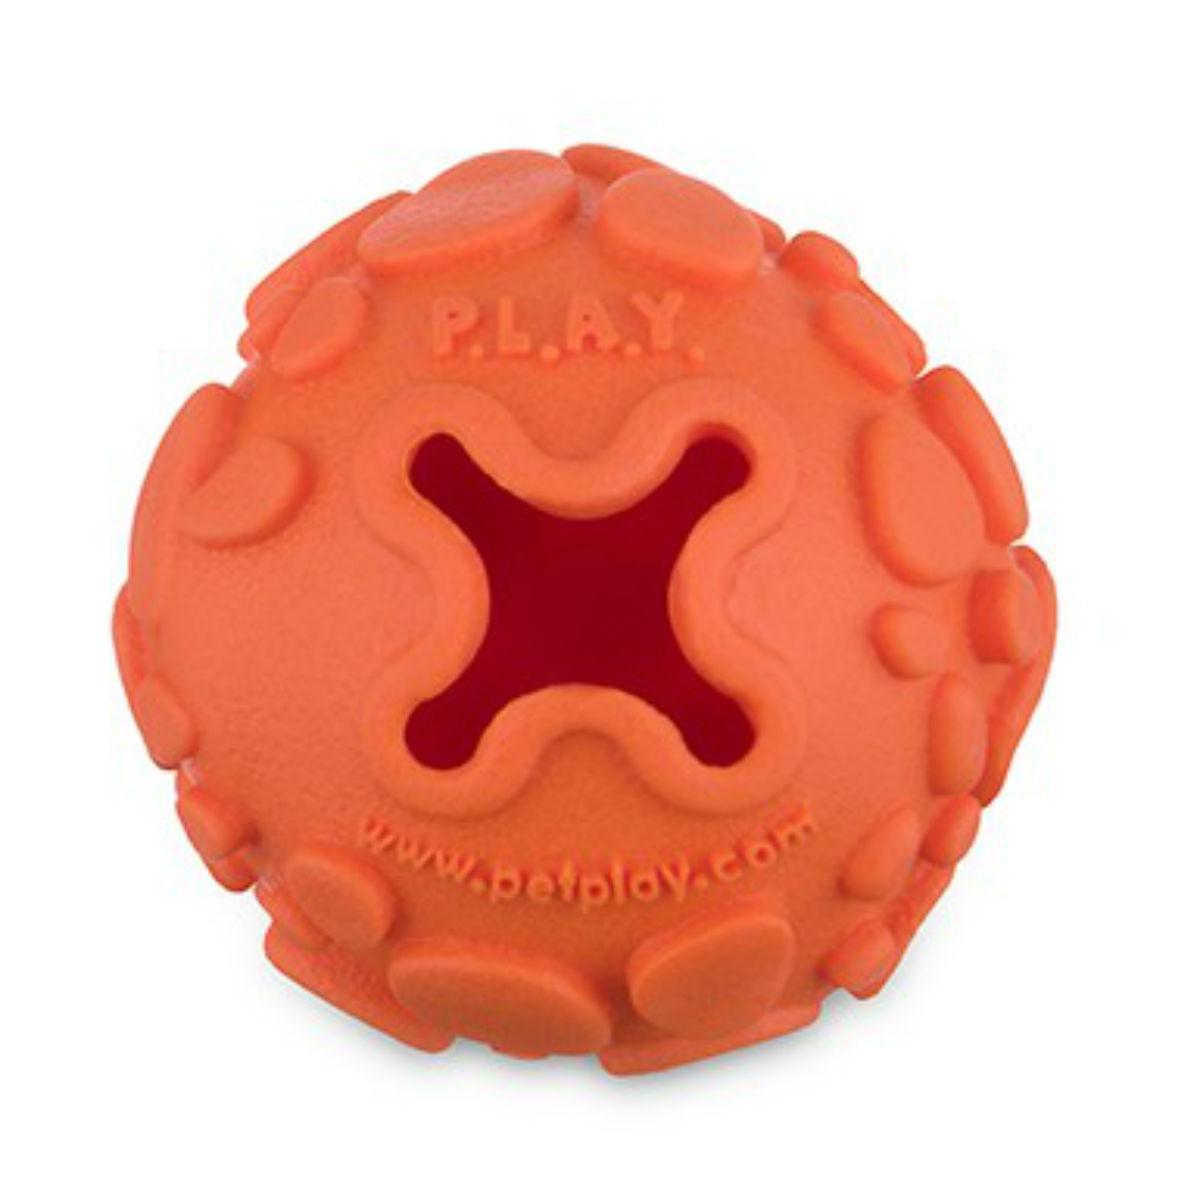 P.L.A.Y. NovaFlex Nova Ball Dog Toy